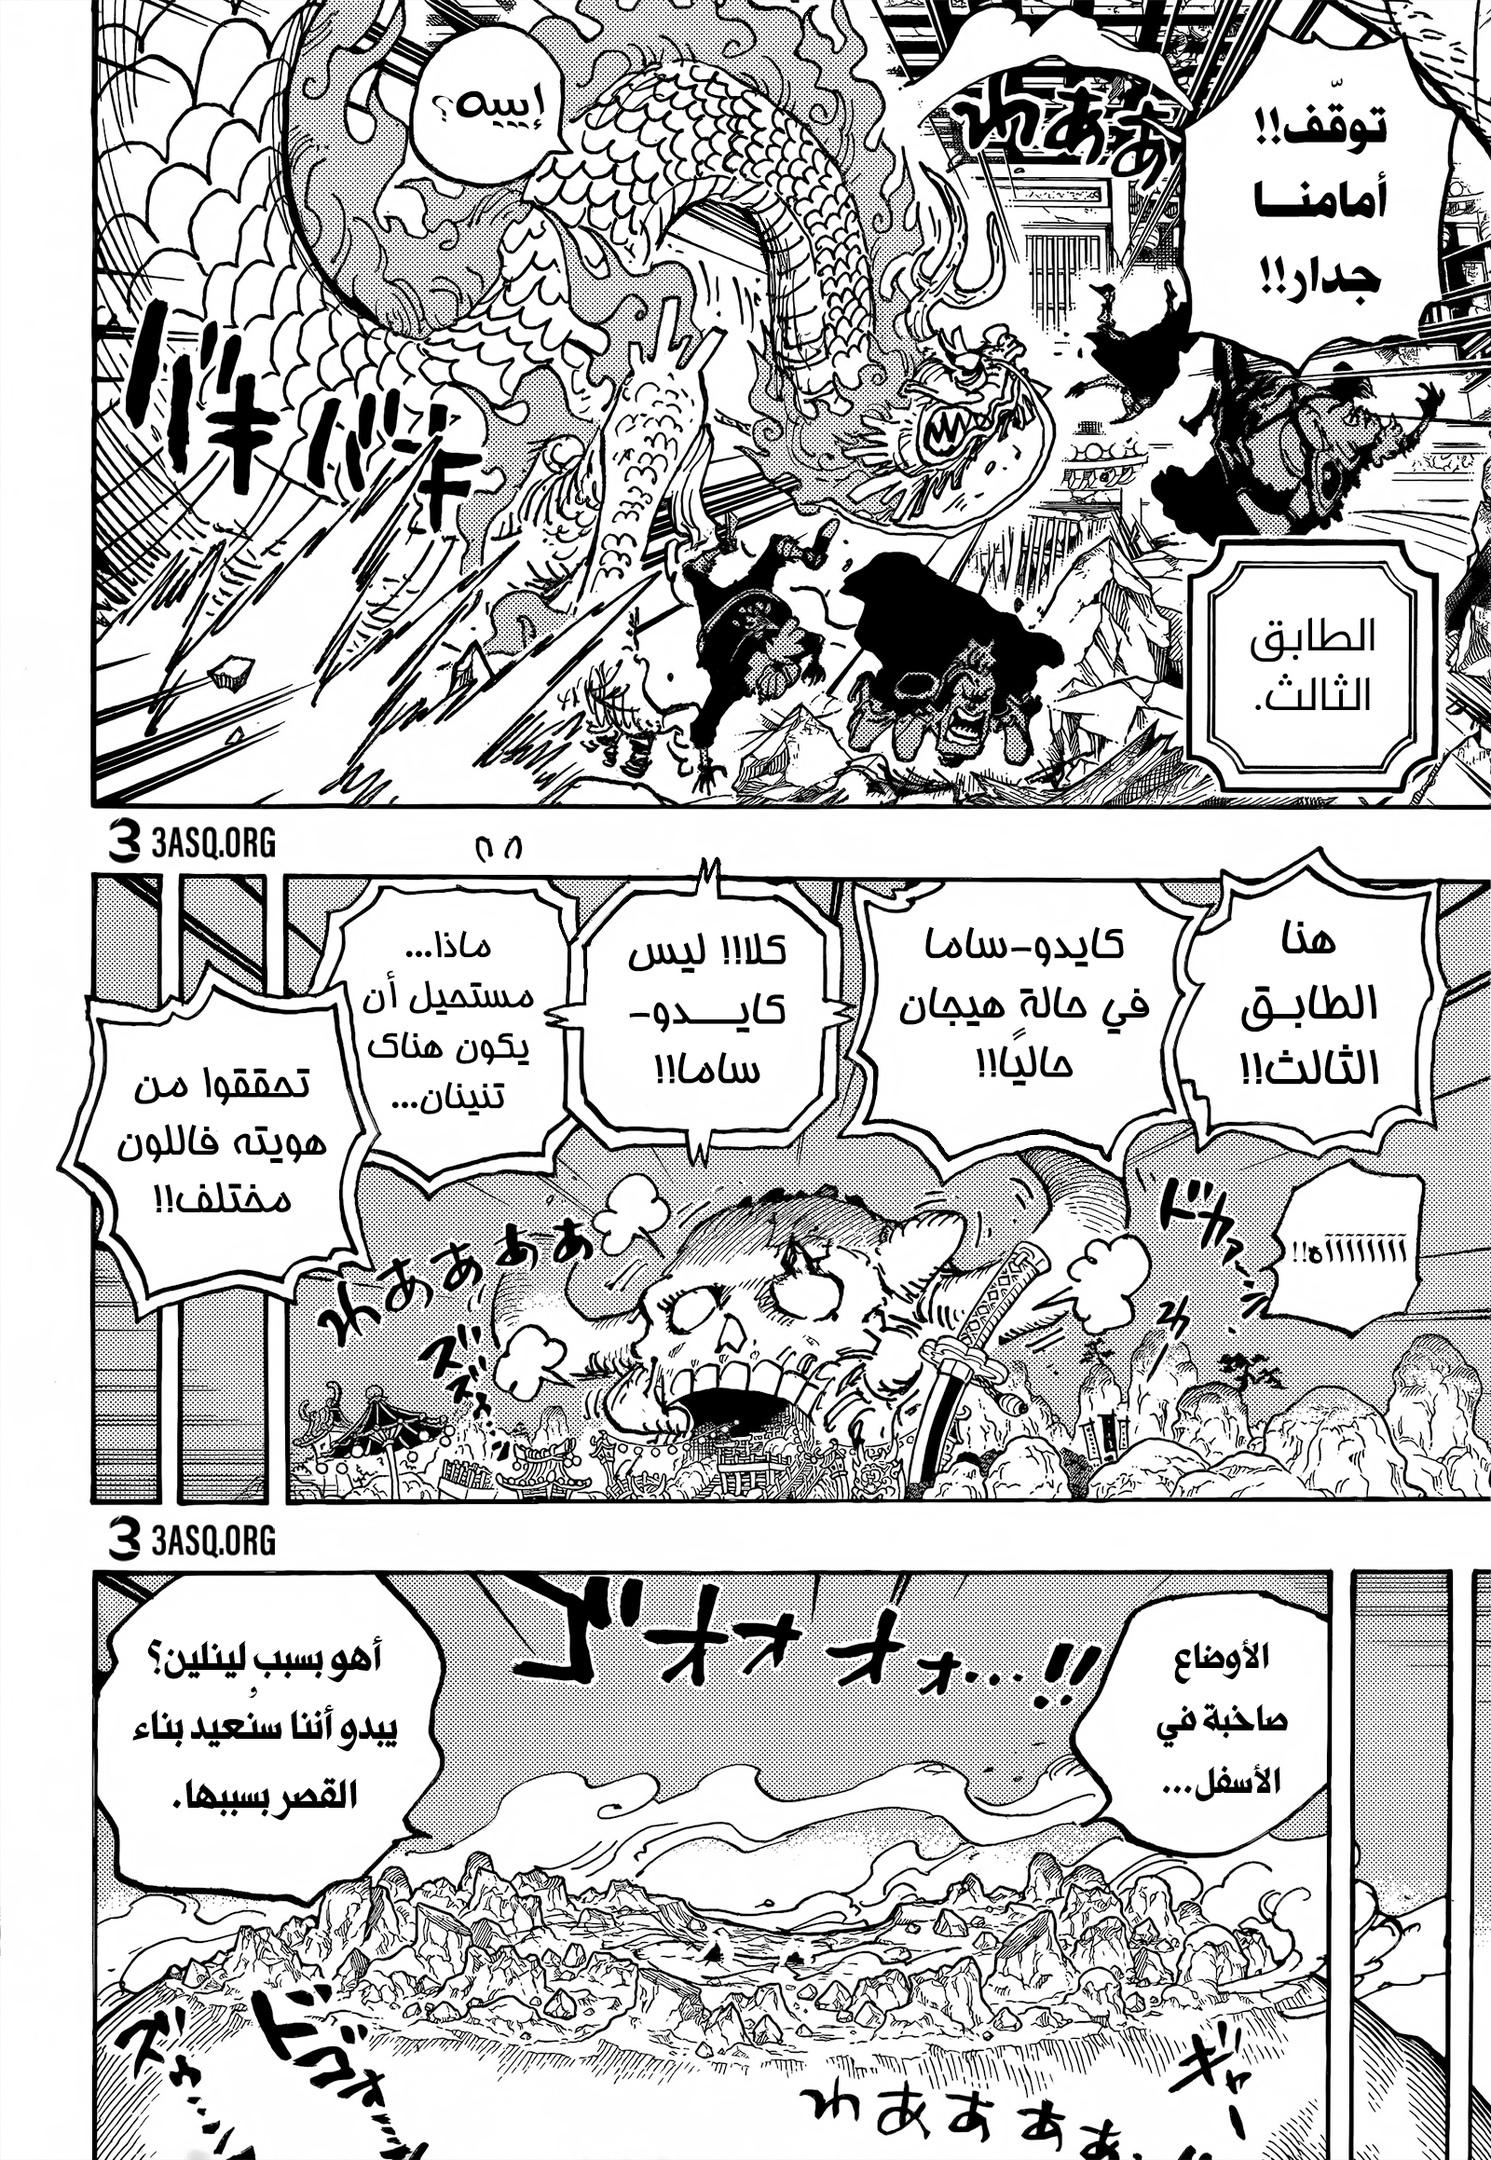 One Piece arab 1025, image №13